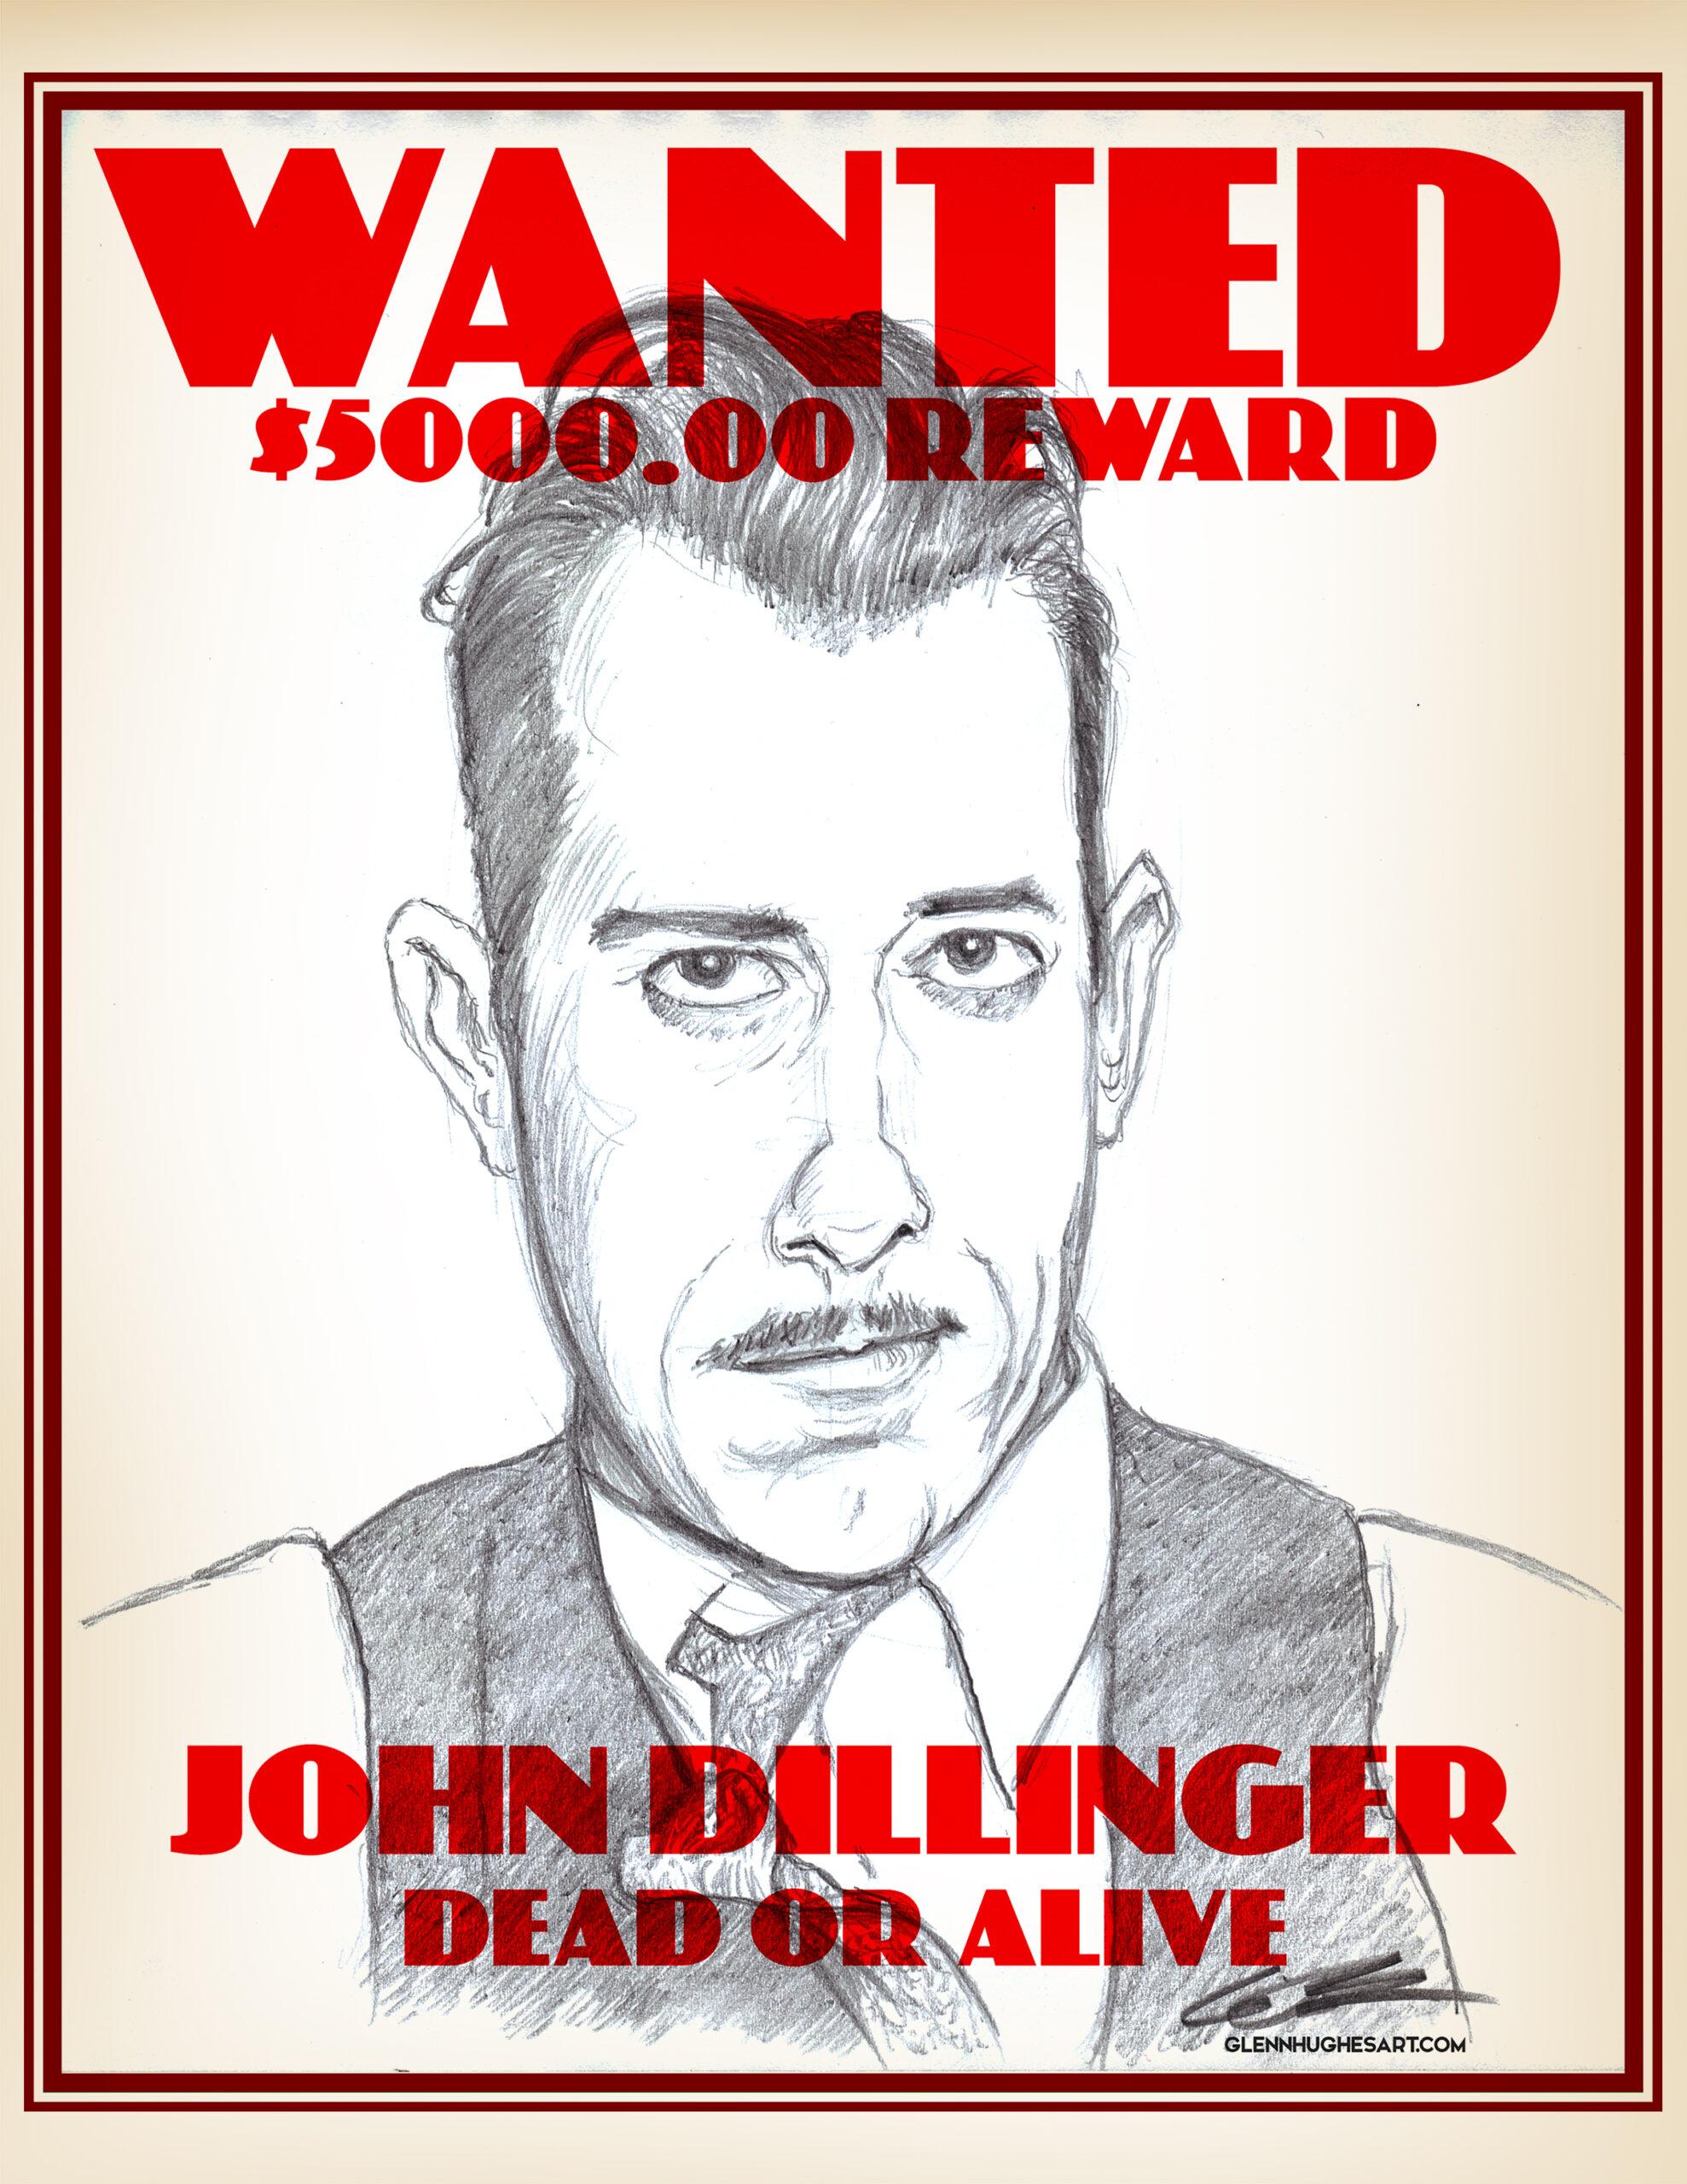 John Dillinger - Wanted